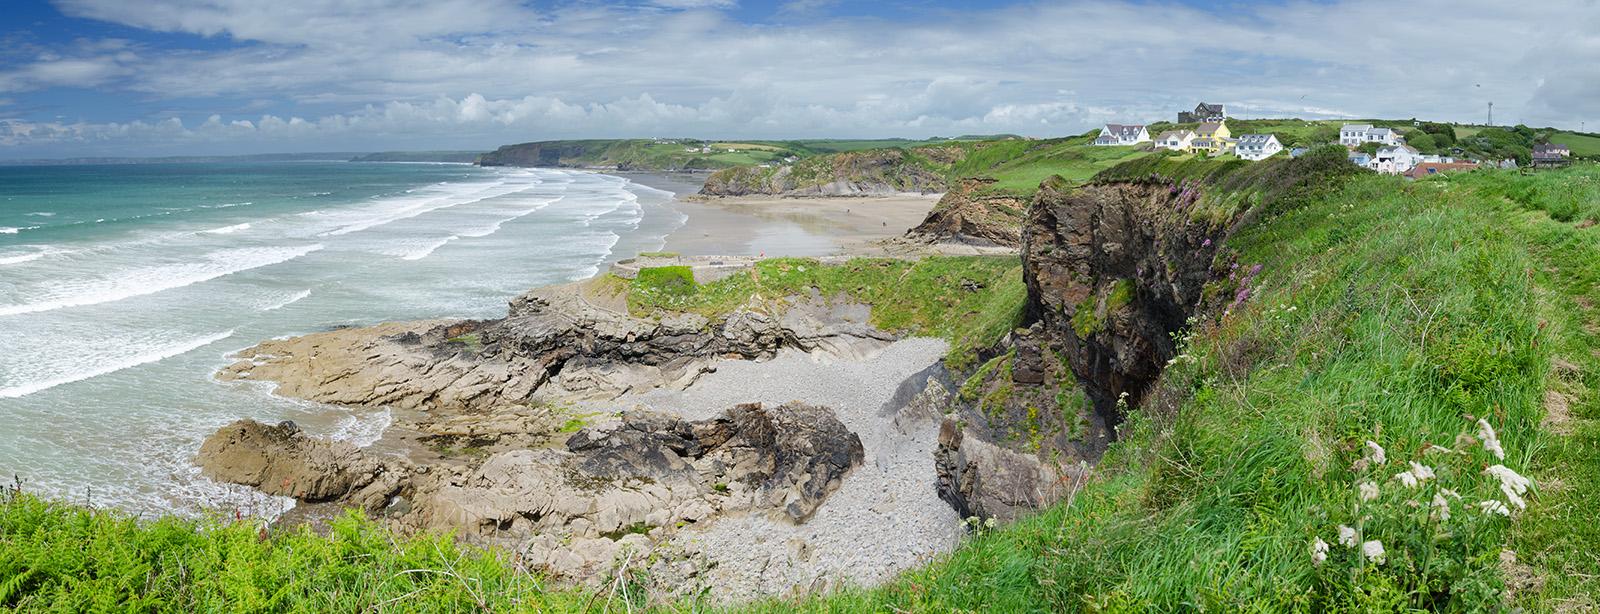 druidstone_haven_marloes-panorama5-2